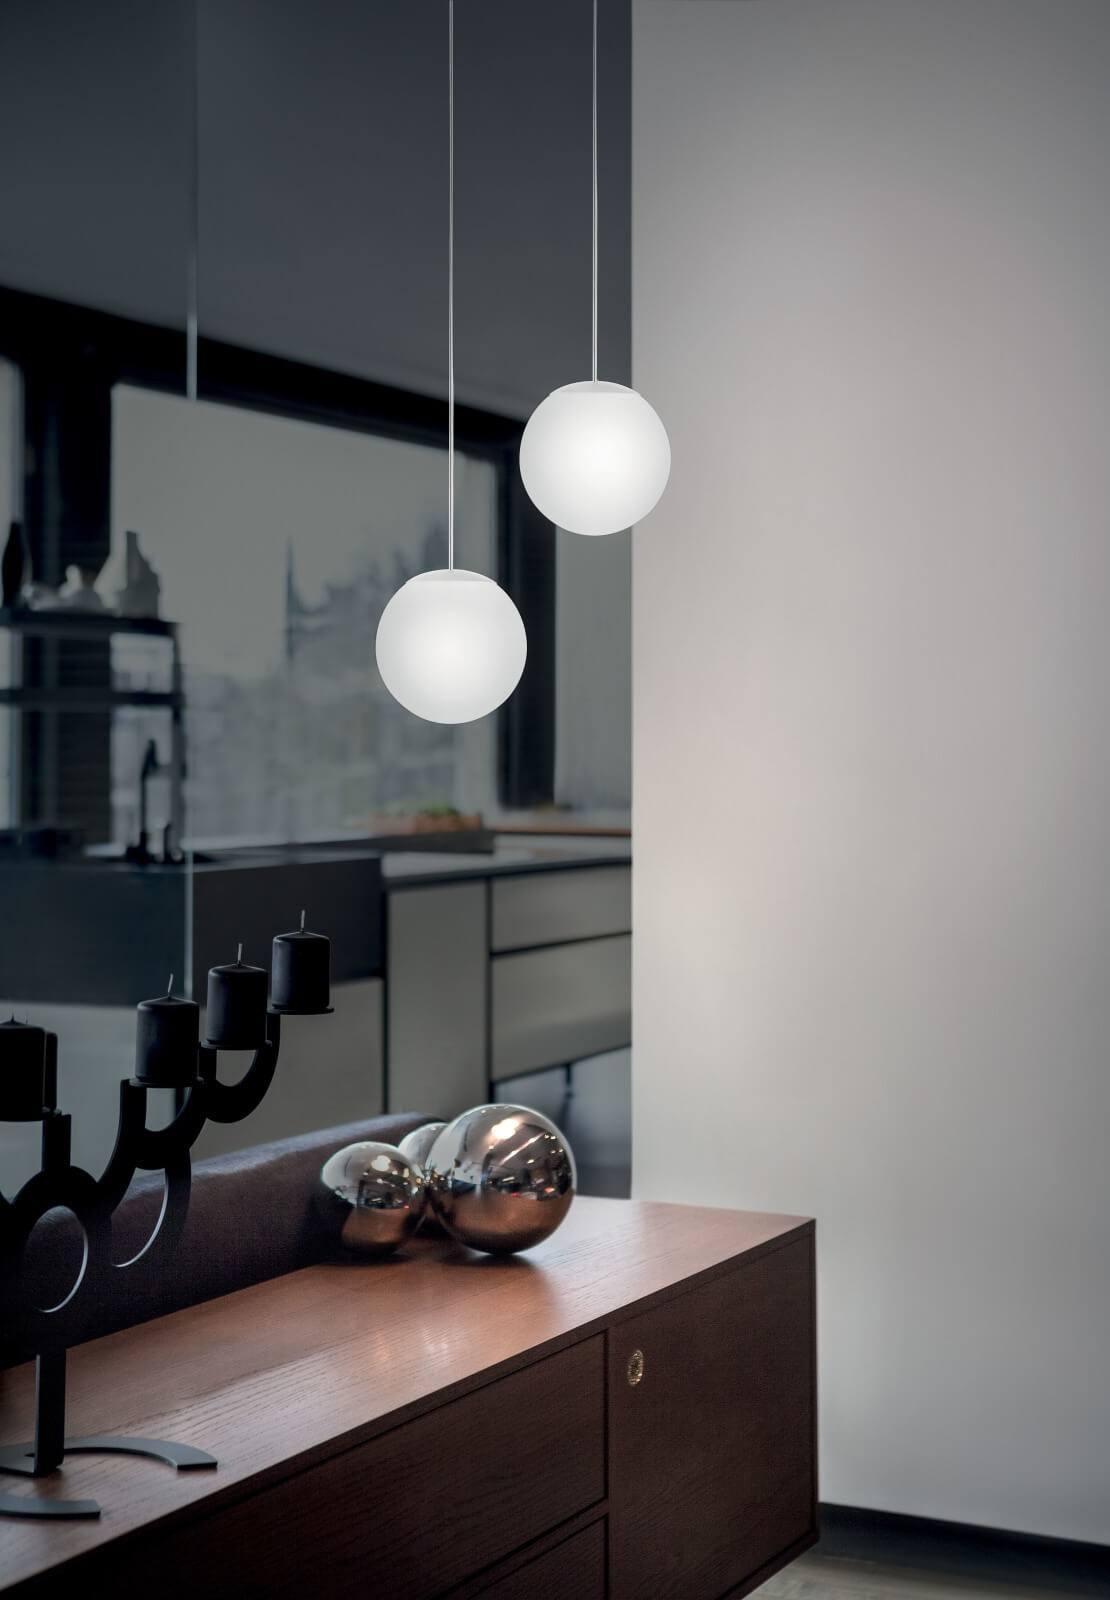 LINEA LIGHT OH! P 10114 lampa wisząca kula LED polietylen